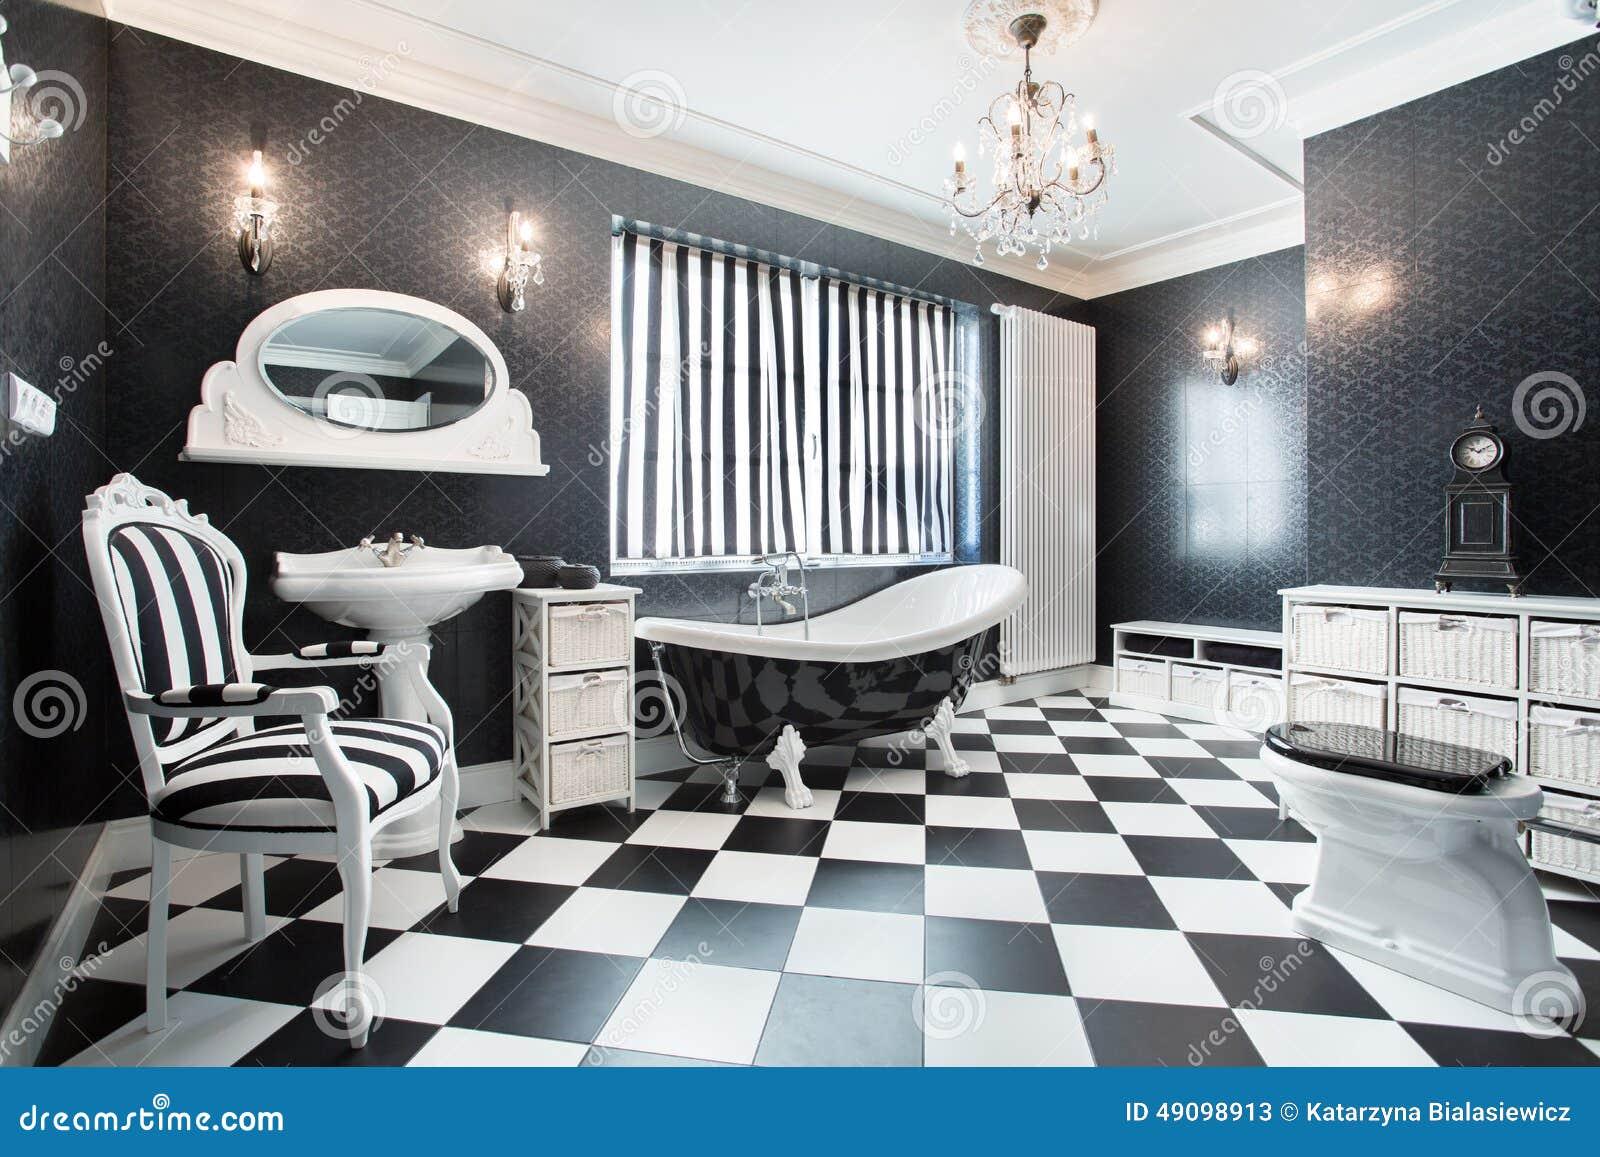 Zwarte wasbak badkamer landelijke badkamer inspiratie marington - Badkamer zwarte vloer ...